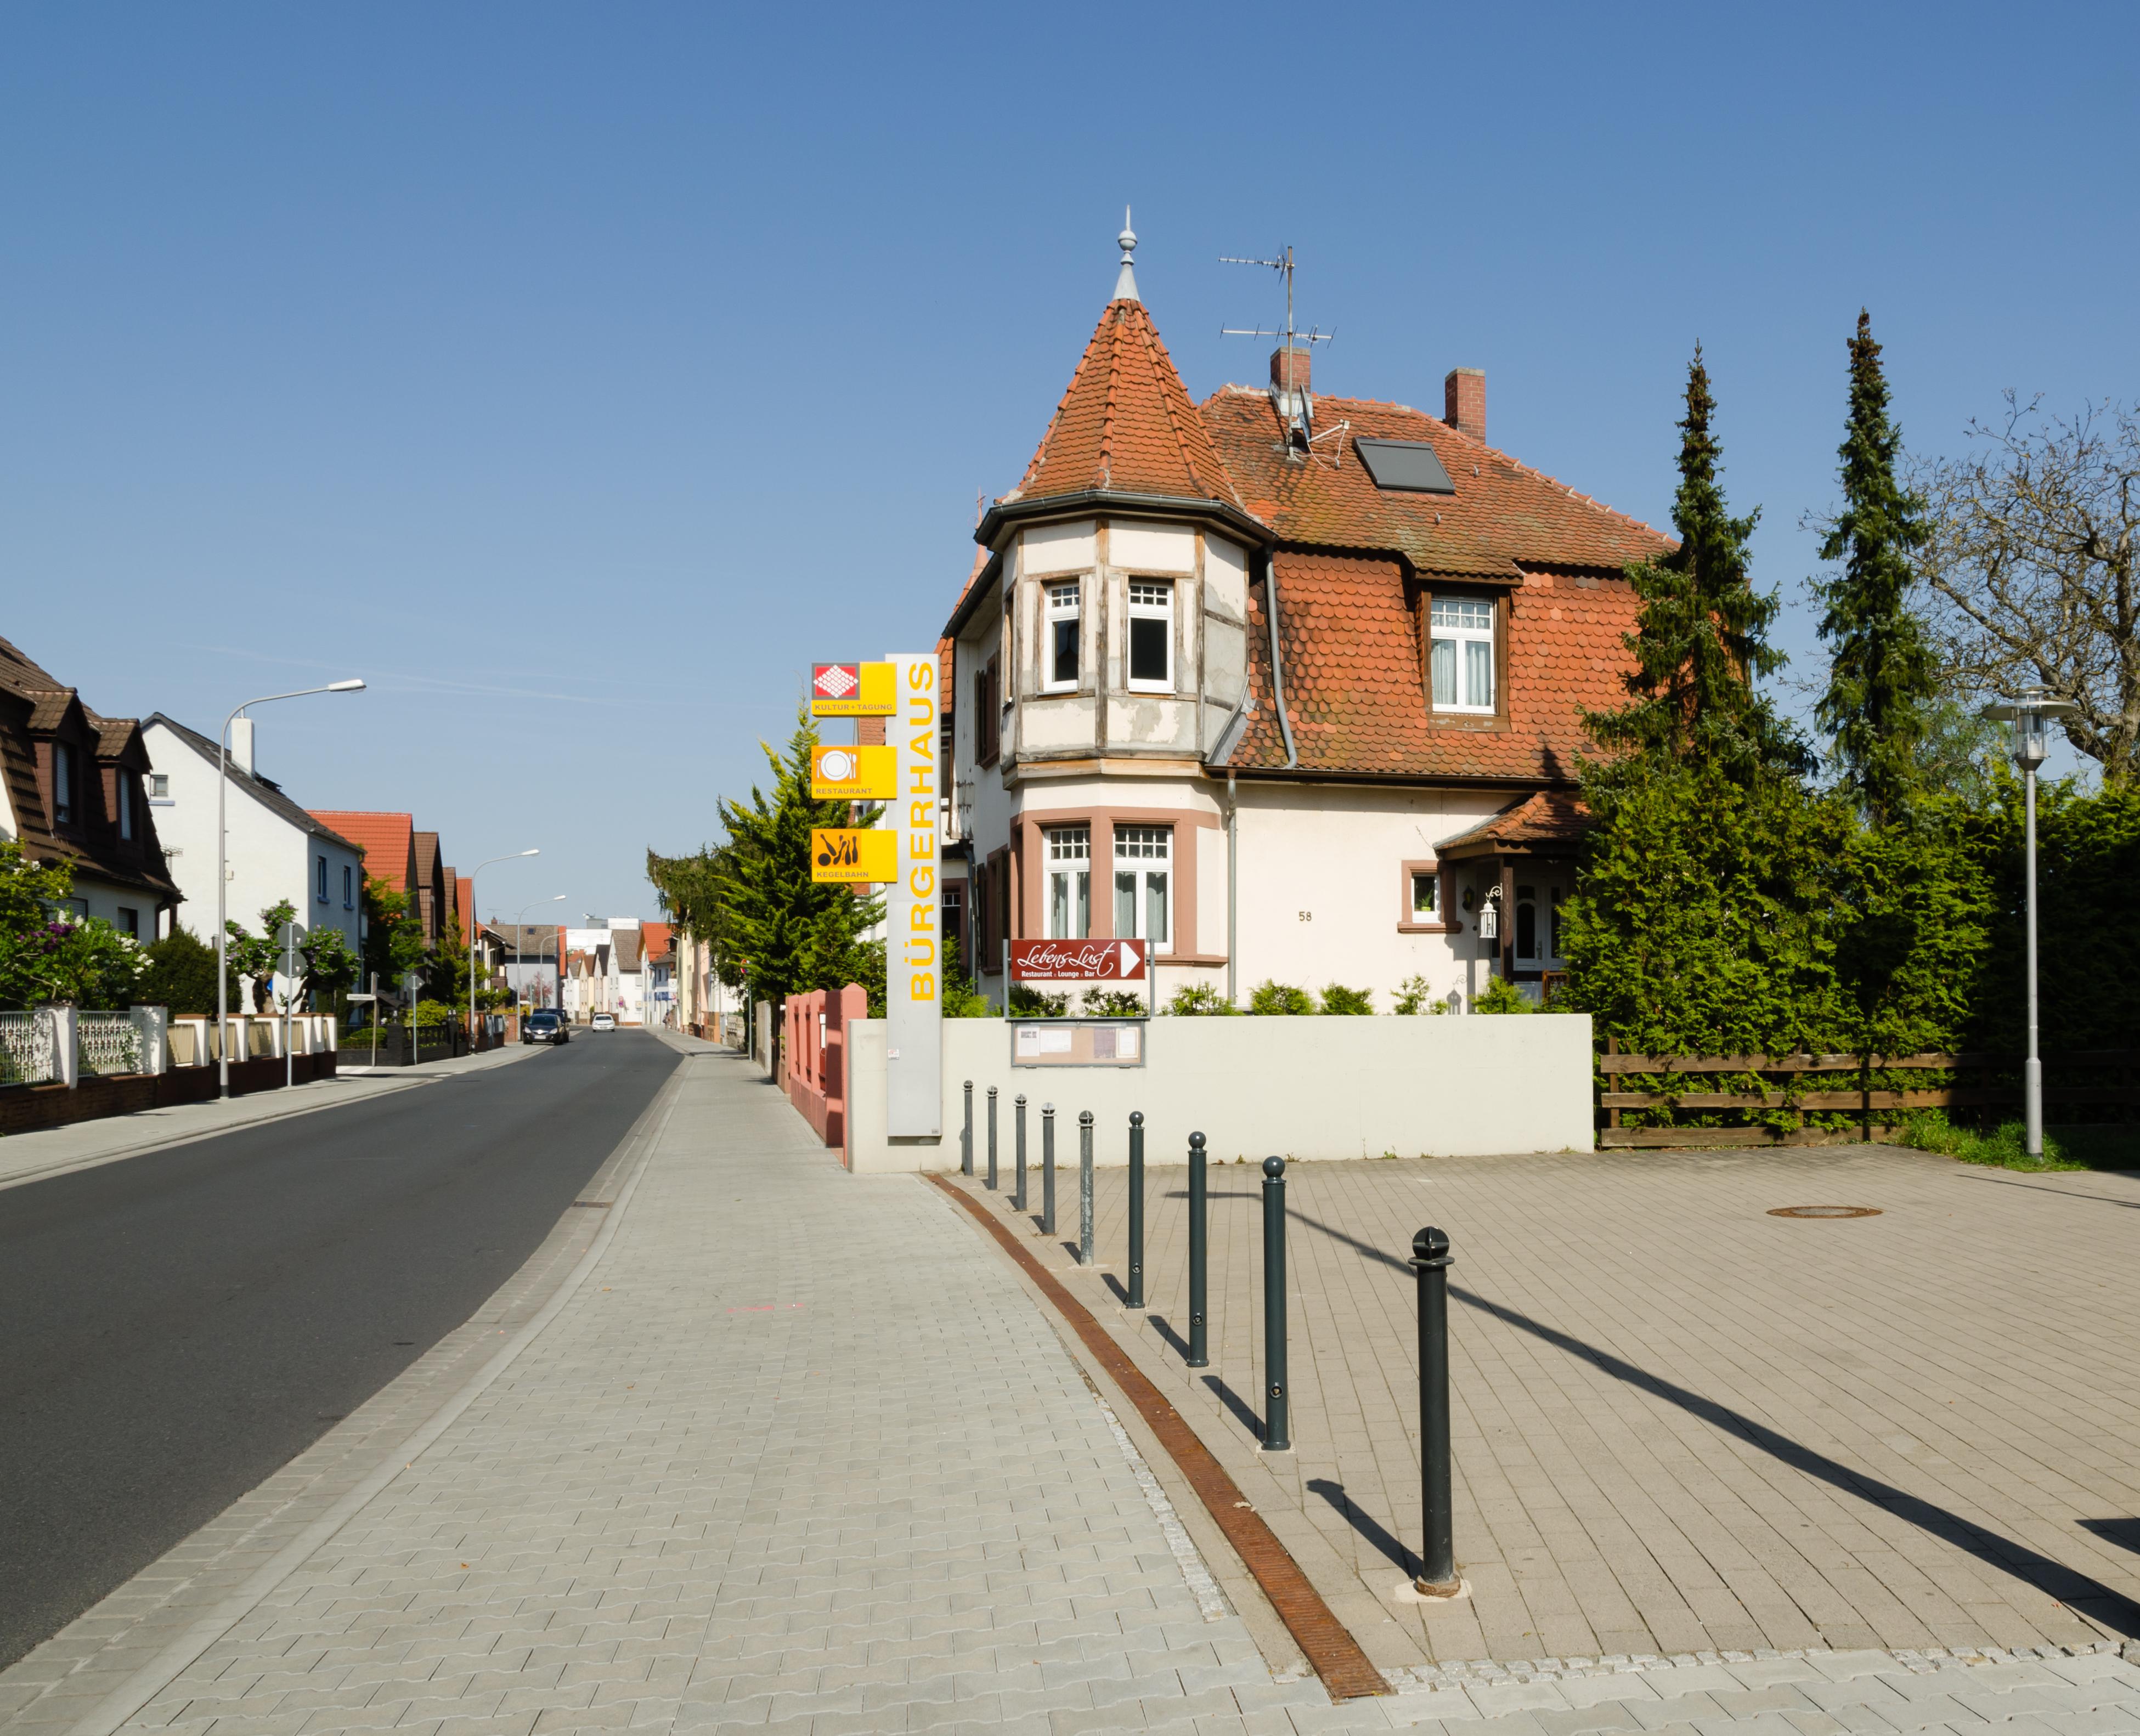 Badesee walldorf mörfelden-walldorf